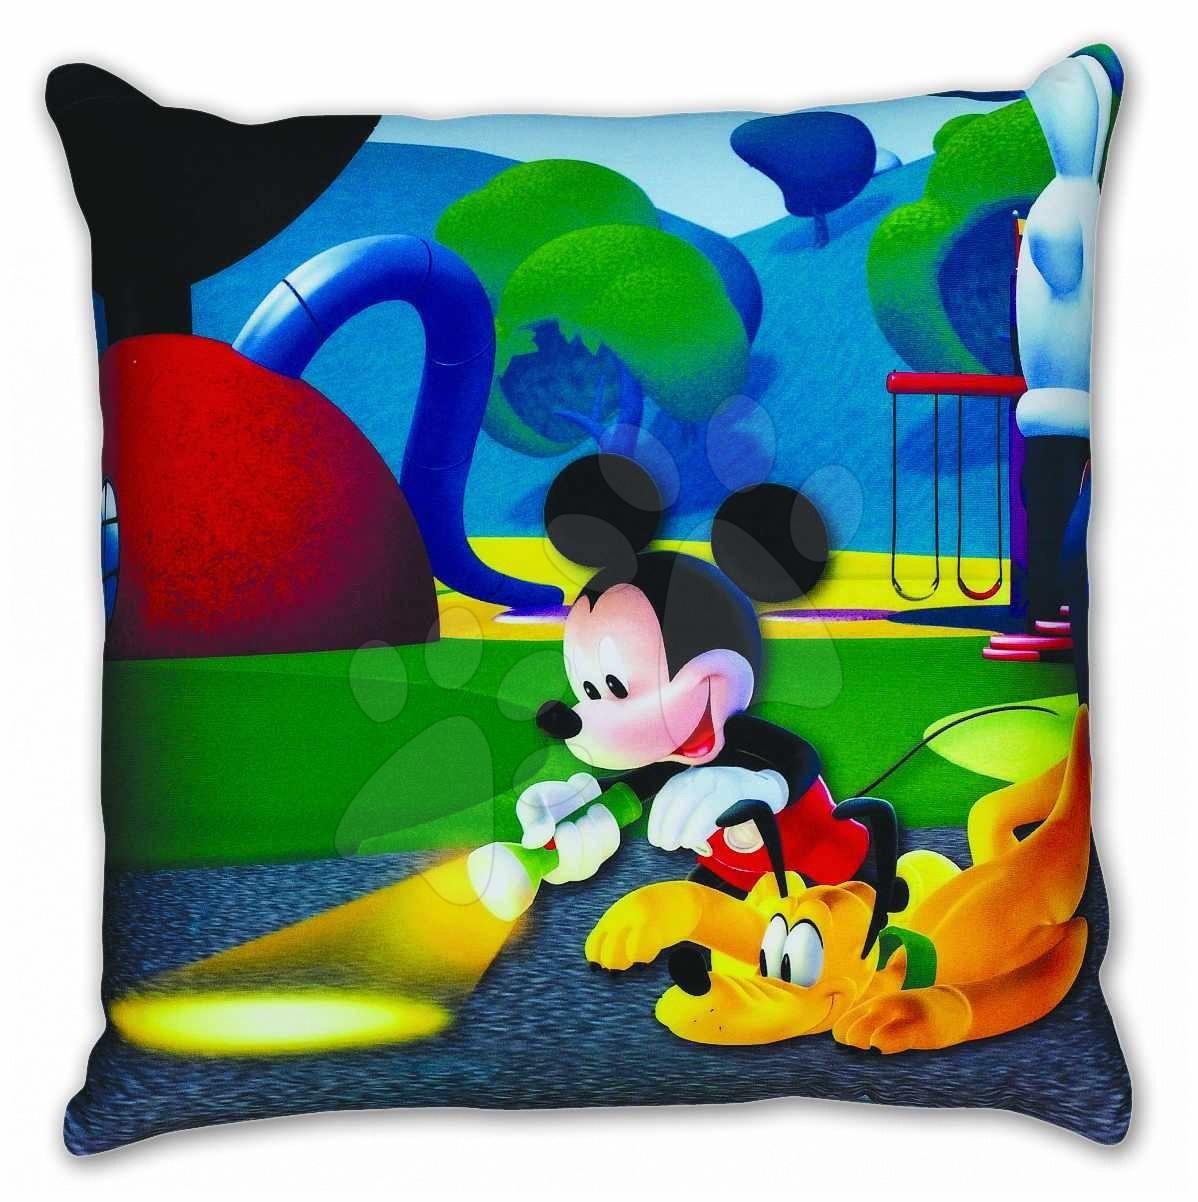 Plyšové vankúše - Vankúš Mickey Mouse Club House Ilanit s mikroguľôčkami